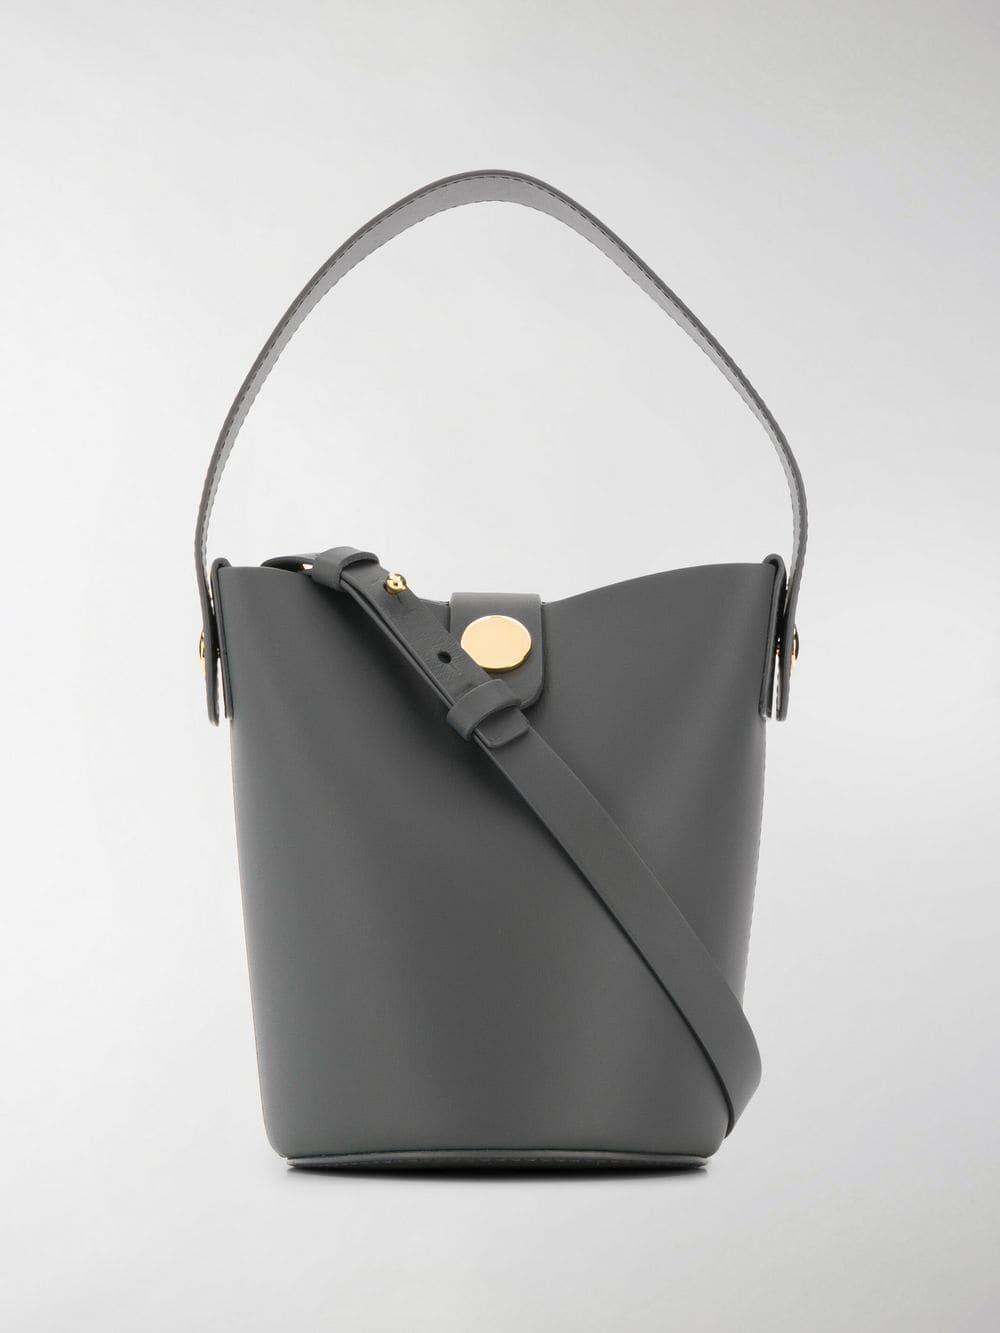 ad4f5497819 Lyst - Sophie Hulme Nano Swing Bucket Bag in Gray